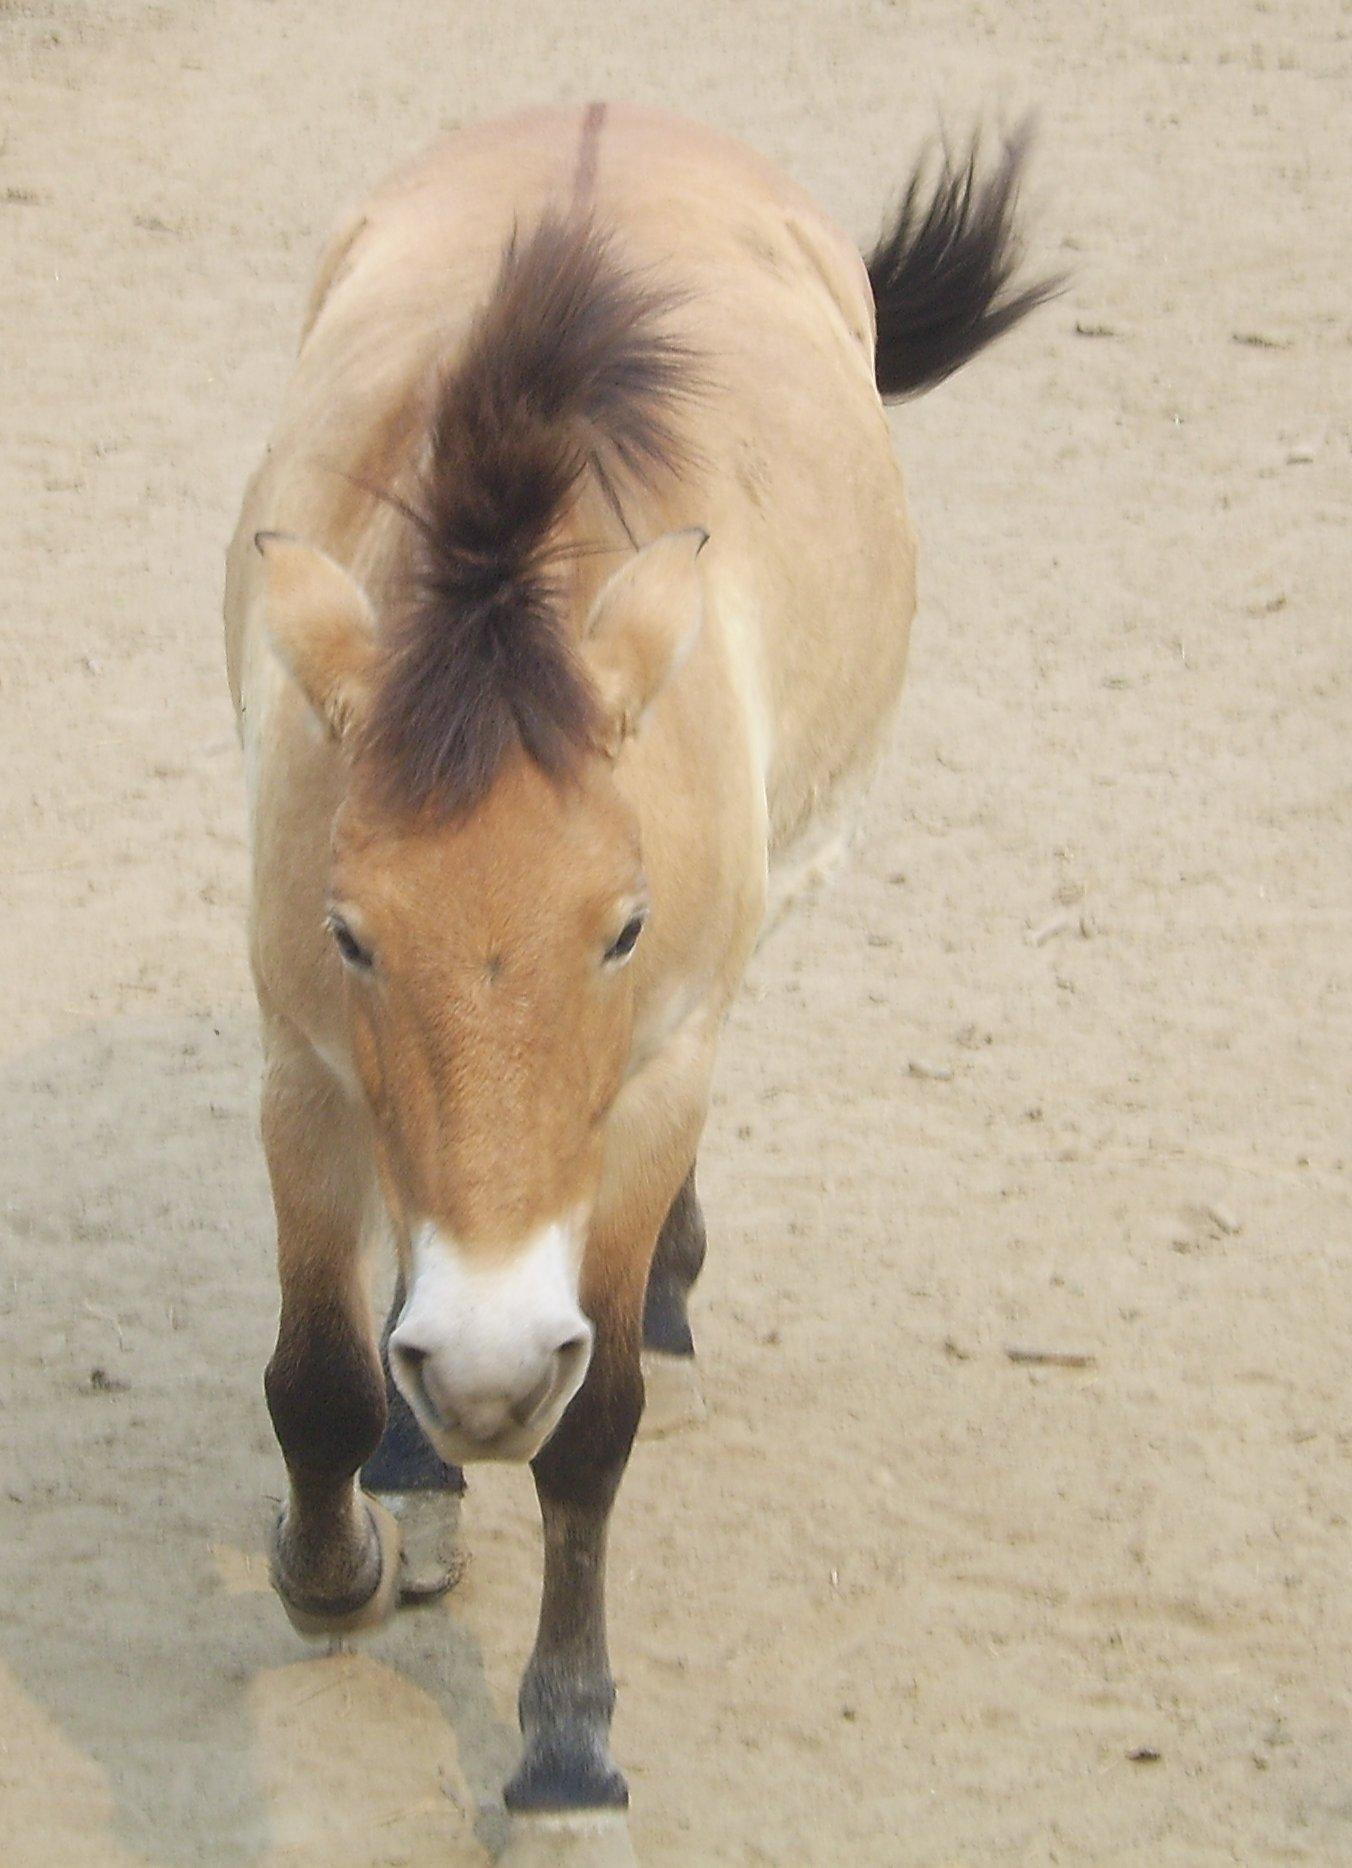 Equus przewalskii-Beijing.jpg